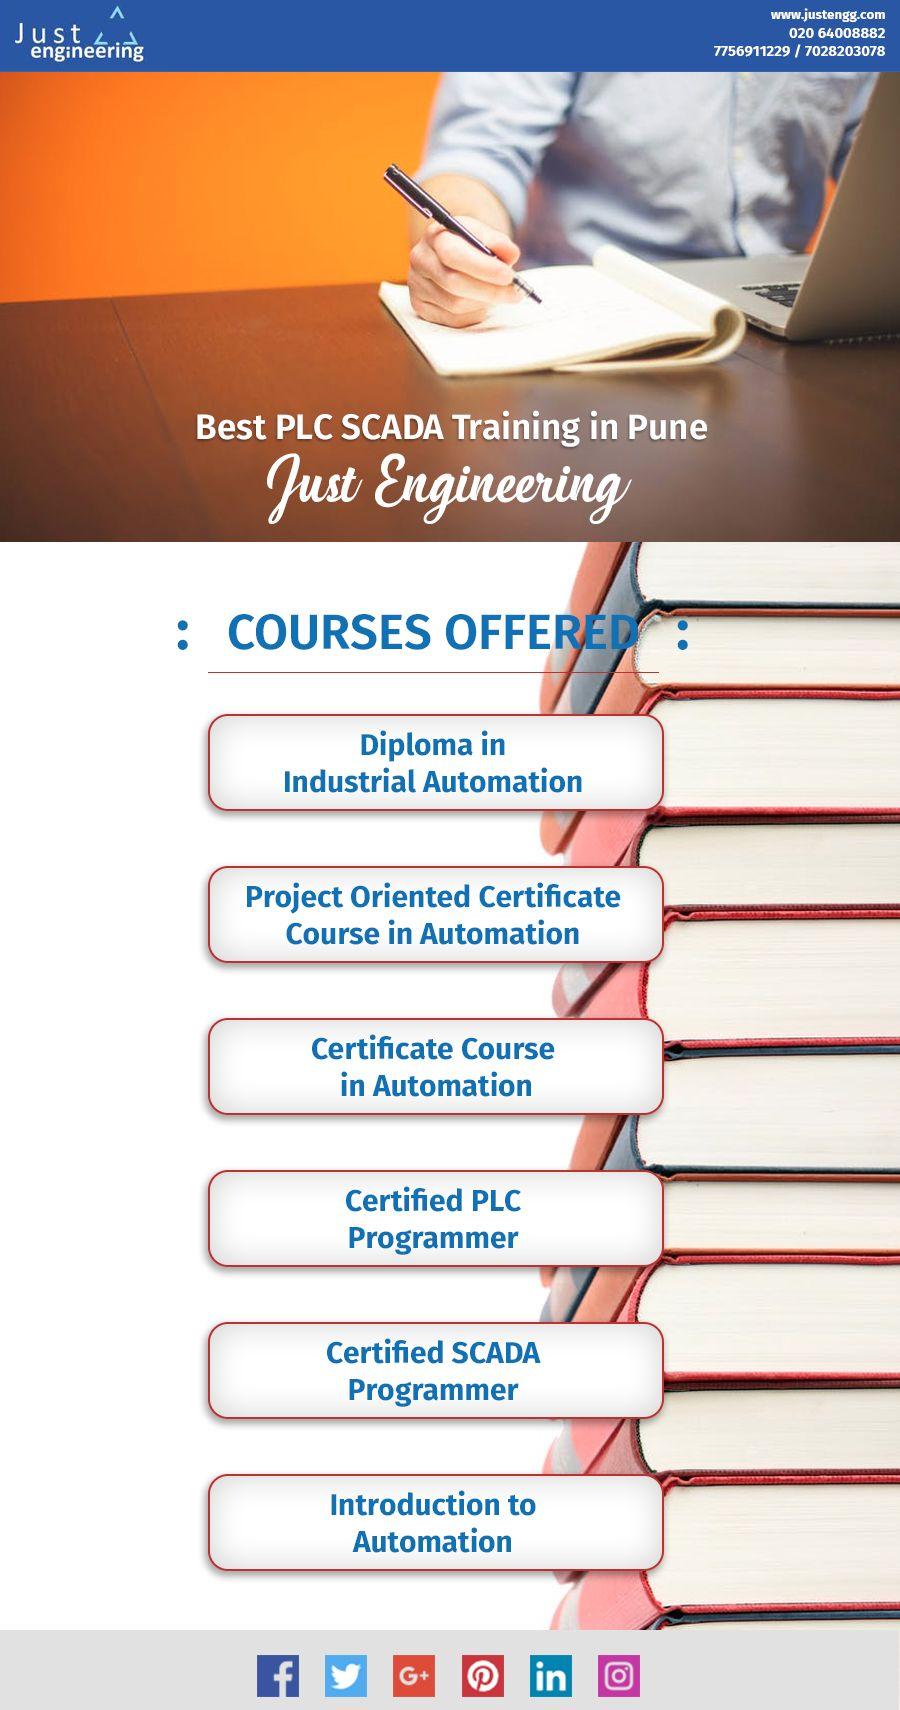 Best plc scada training in pune just engineering just